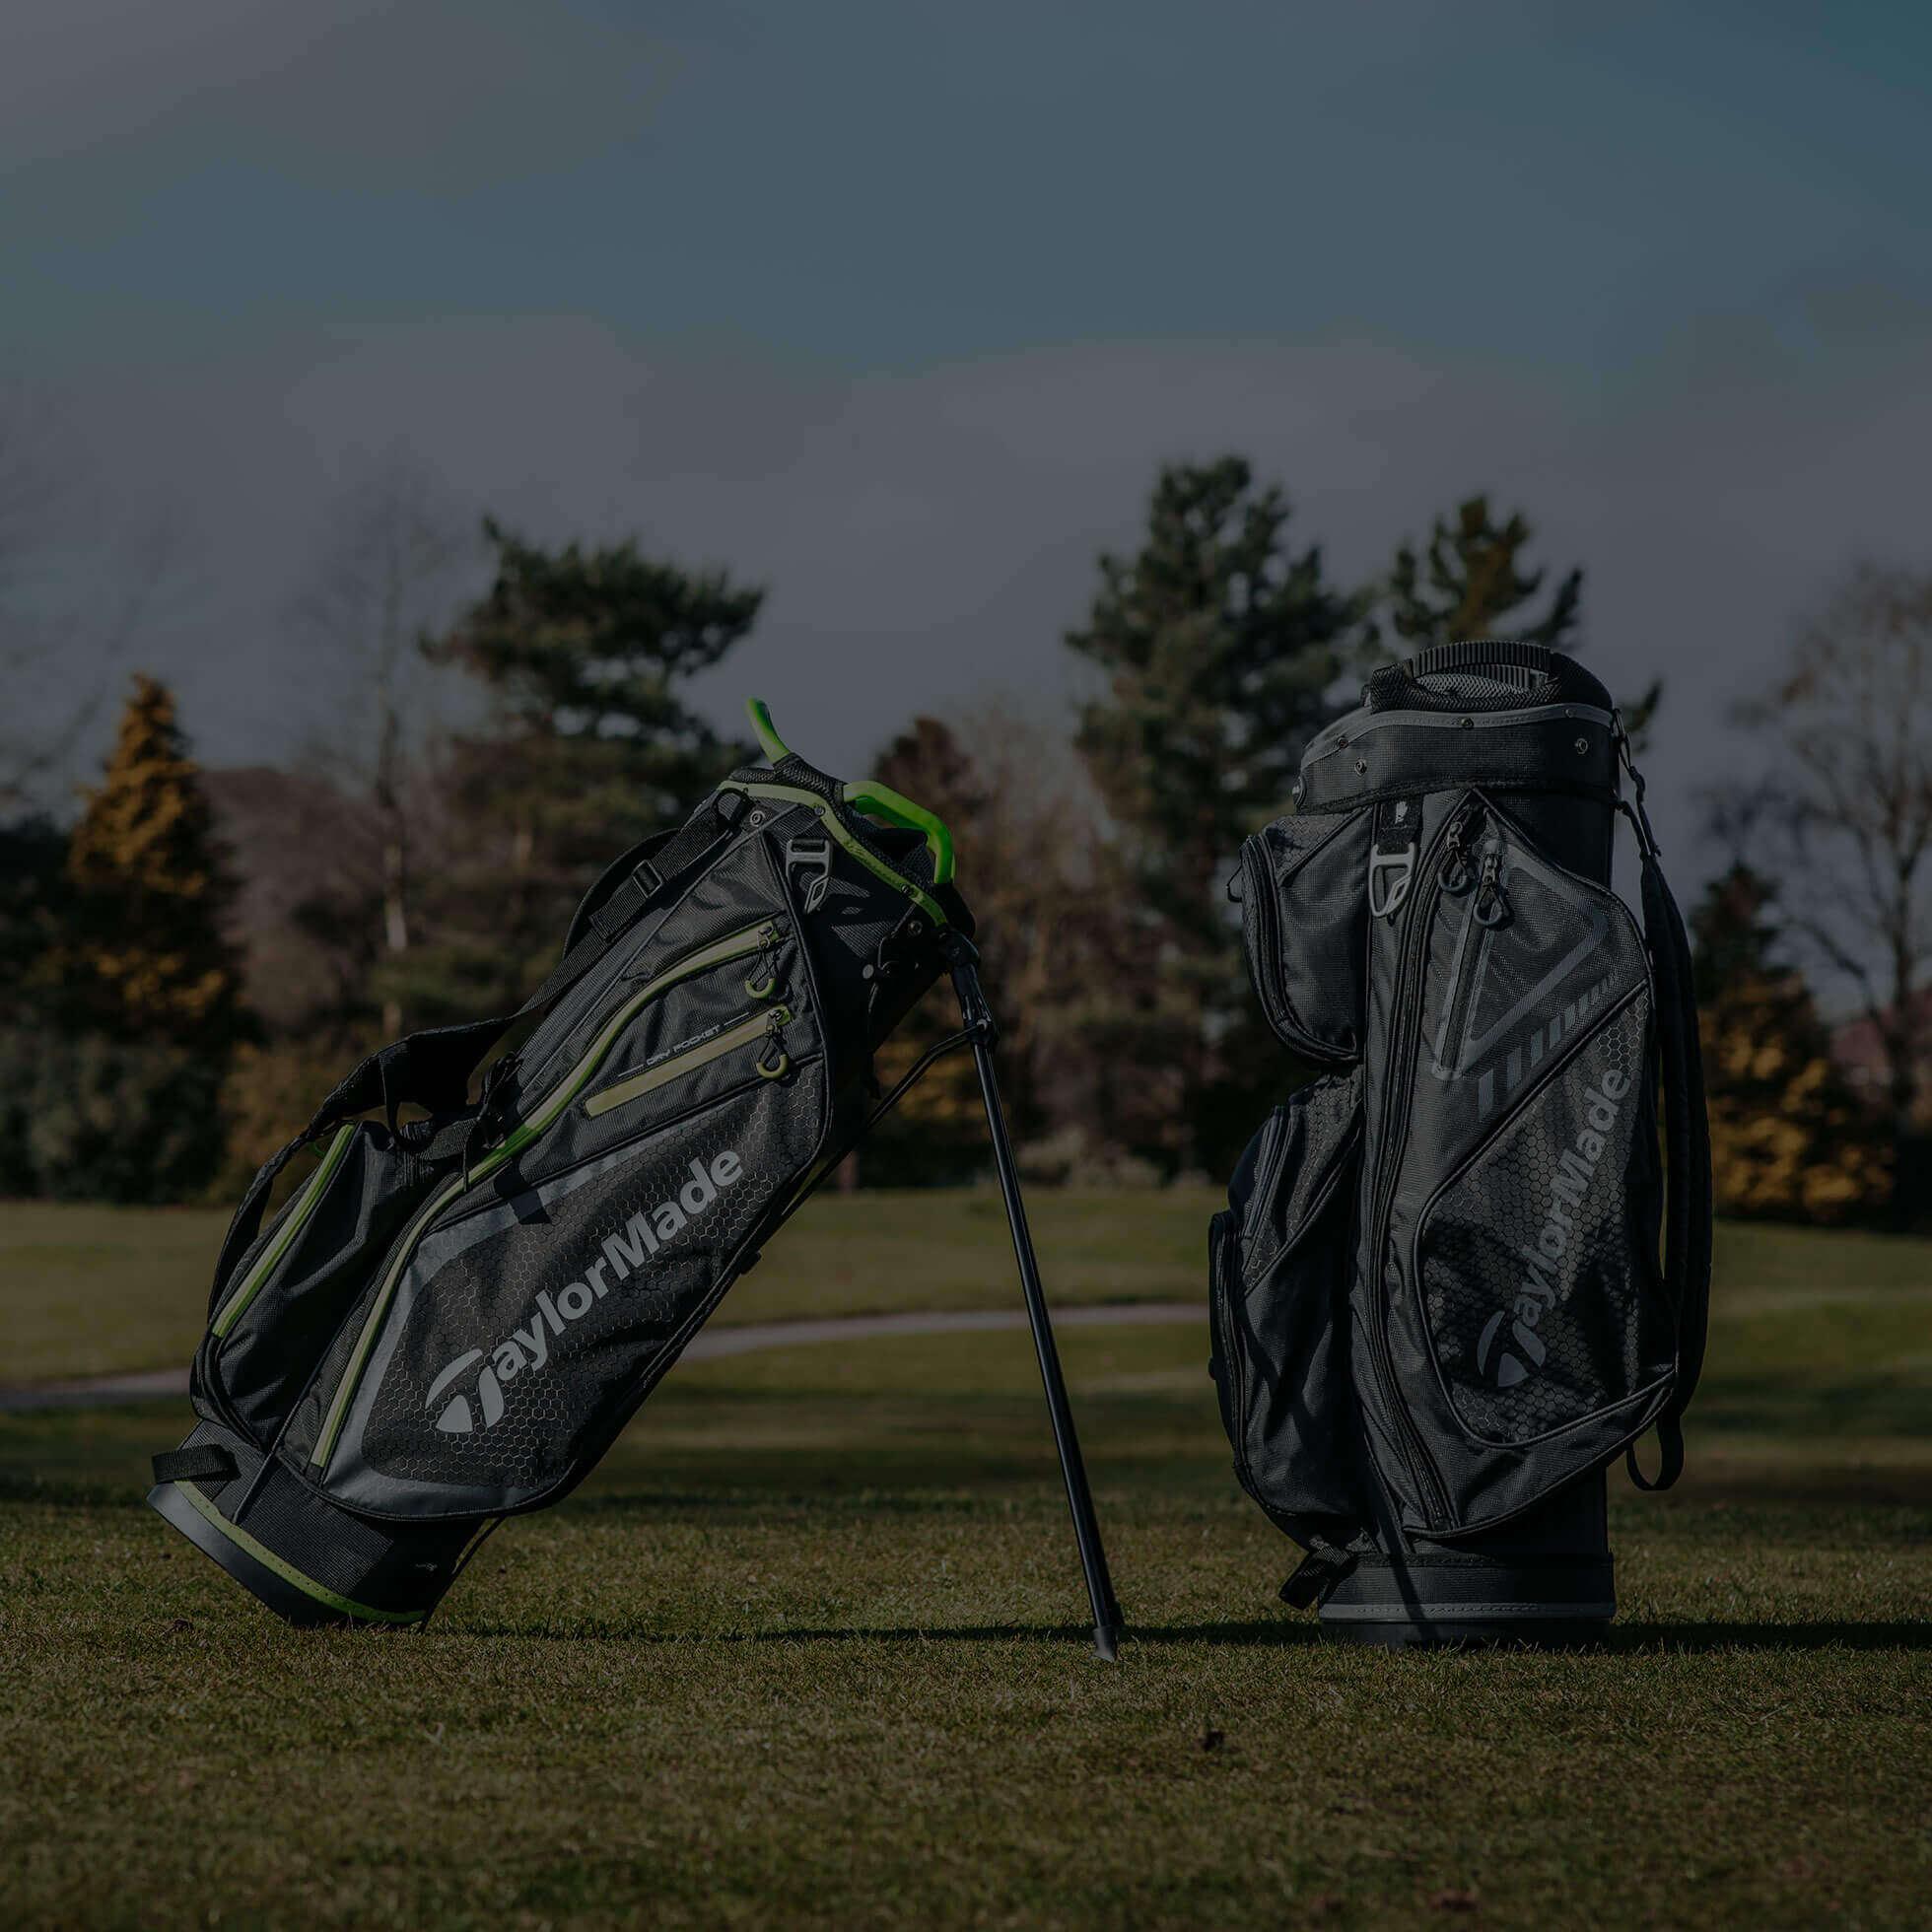 Get Into Golf Golf Bags